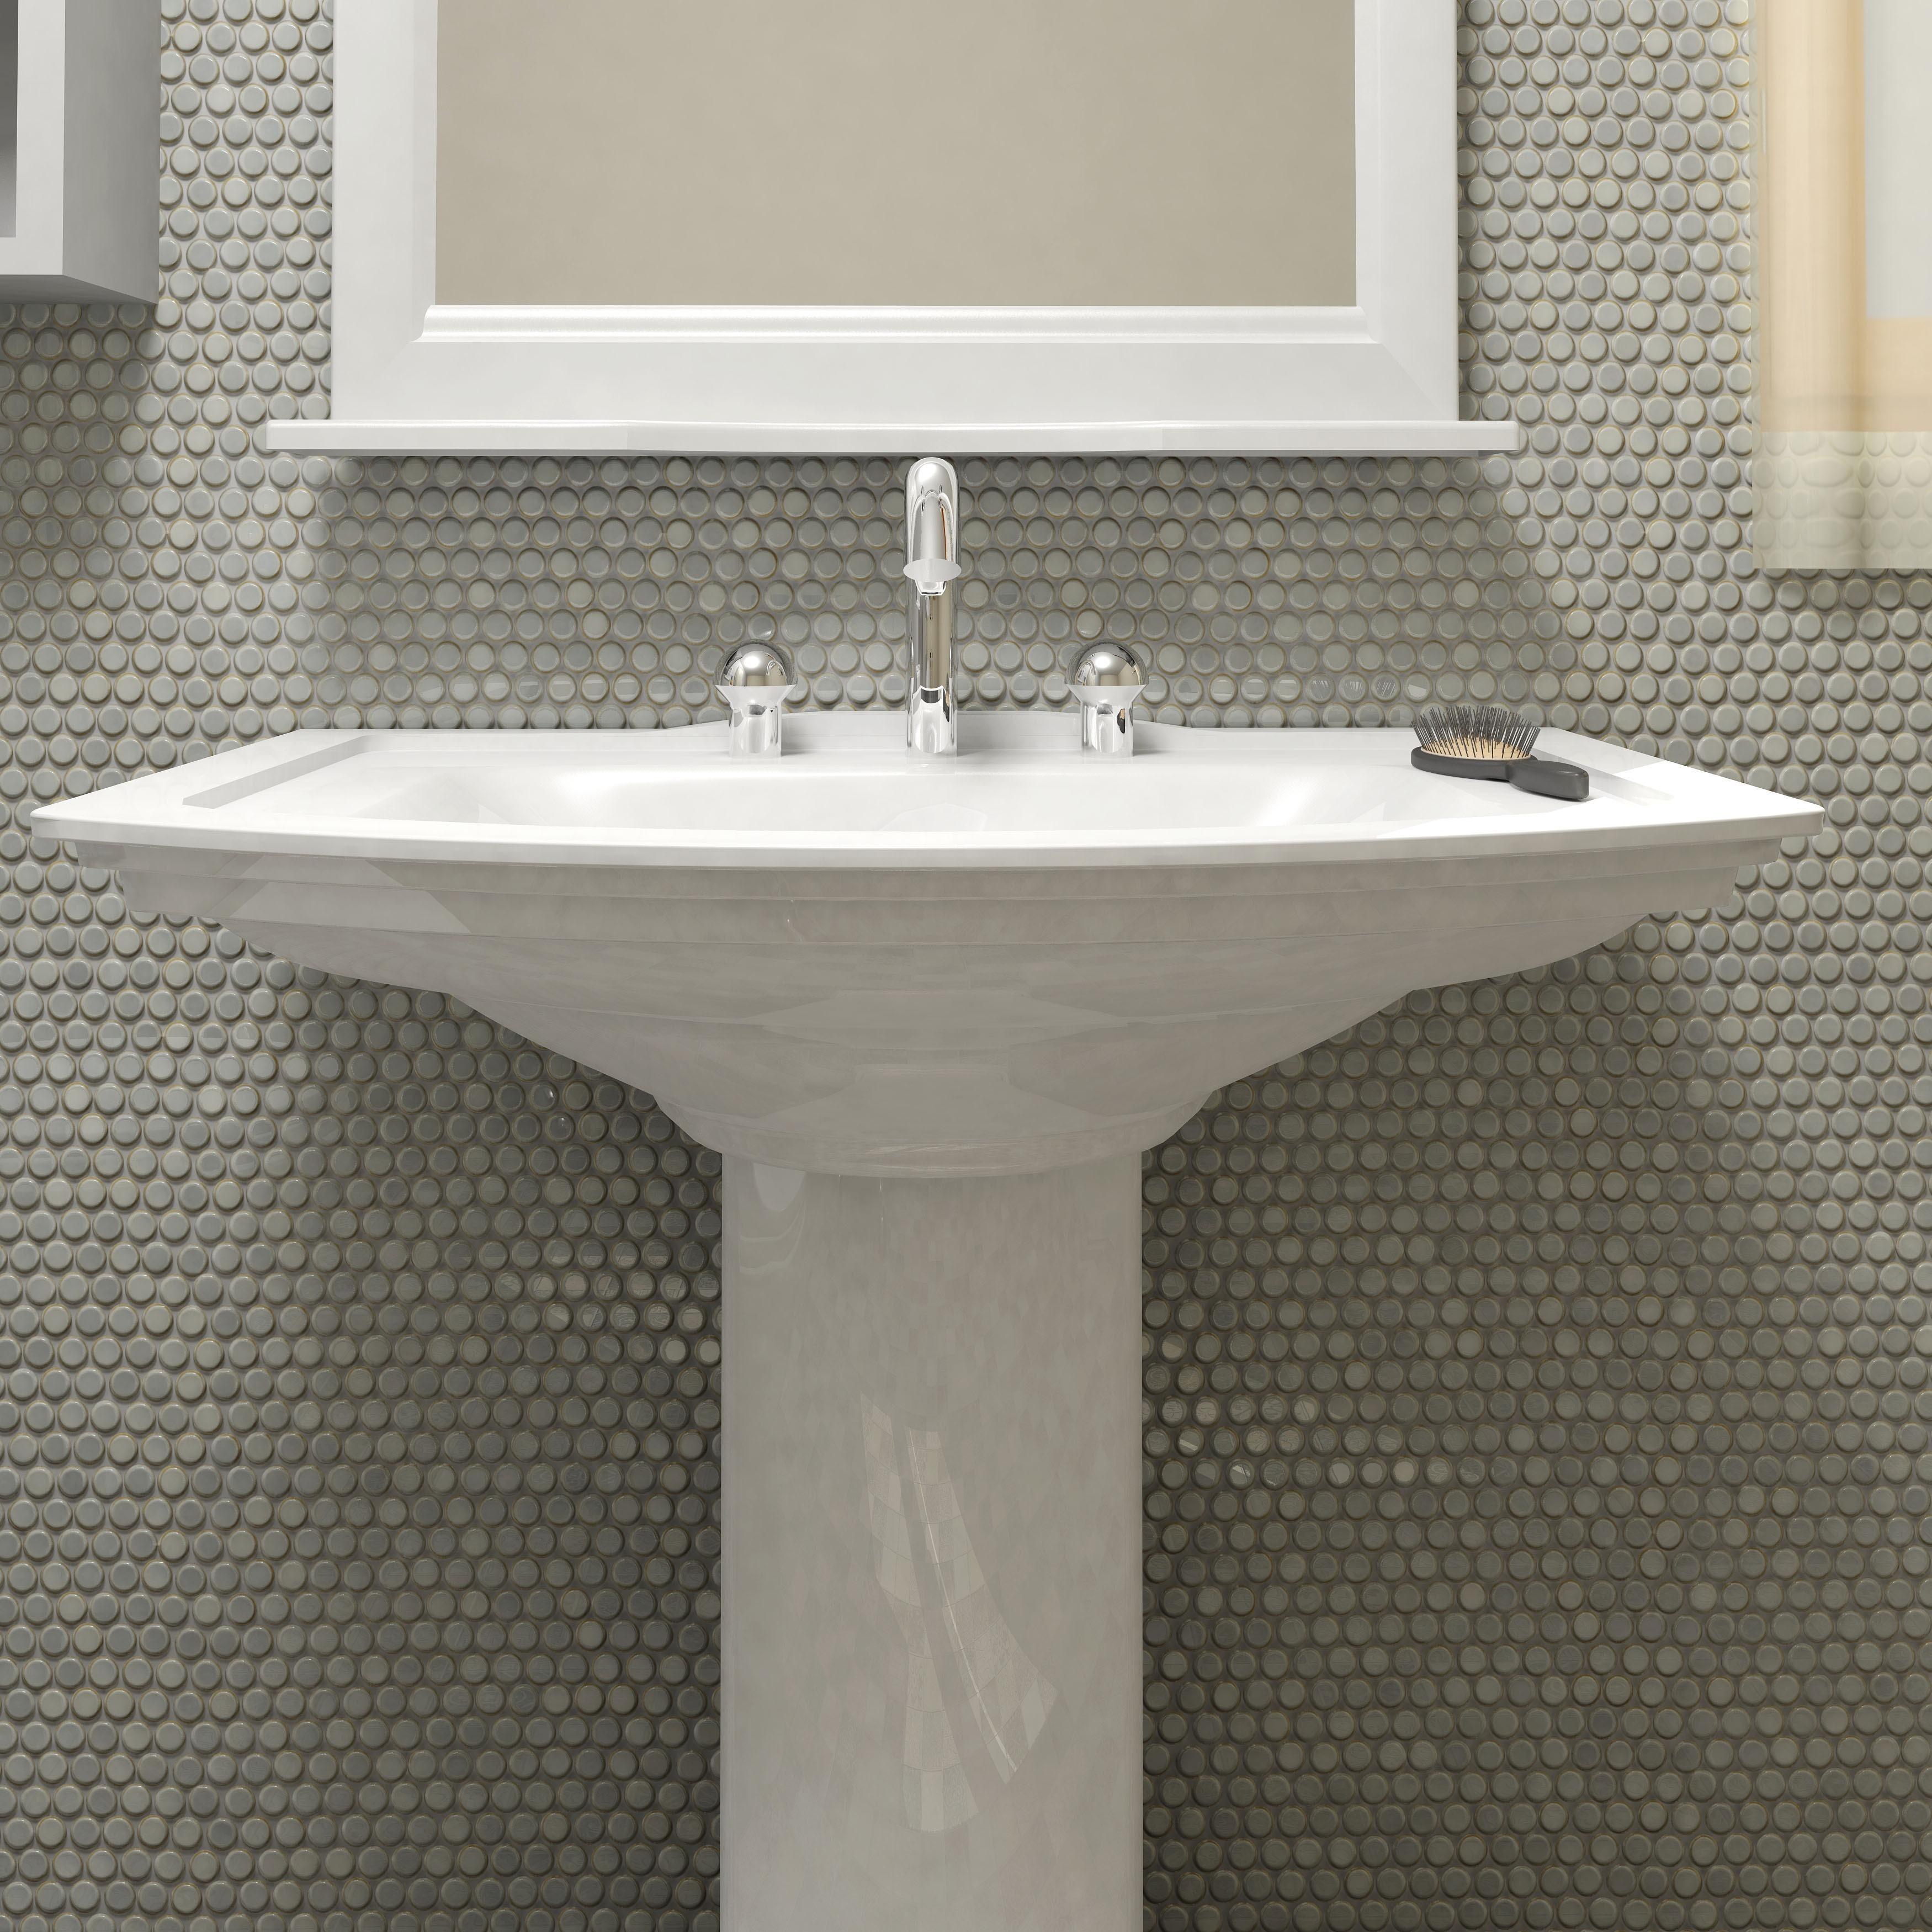 Shop Somertile 12x12625 Inch Penny Grey Eye Porcelain Mosaic Floor